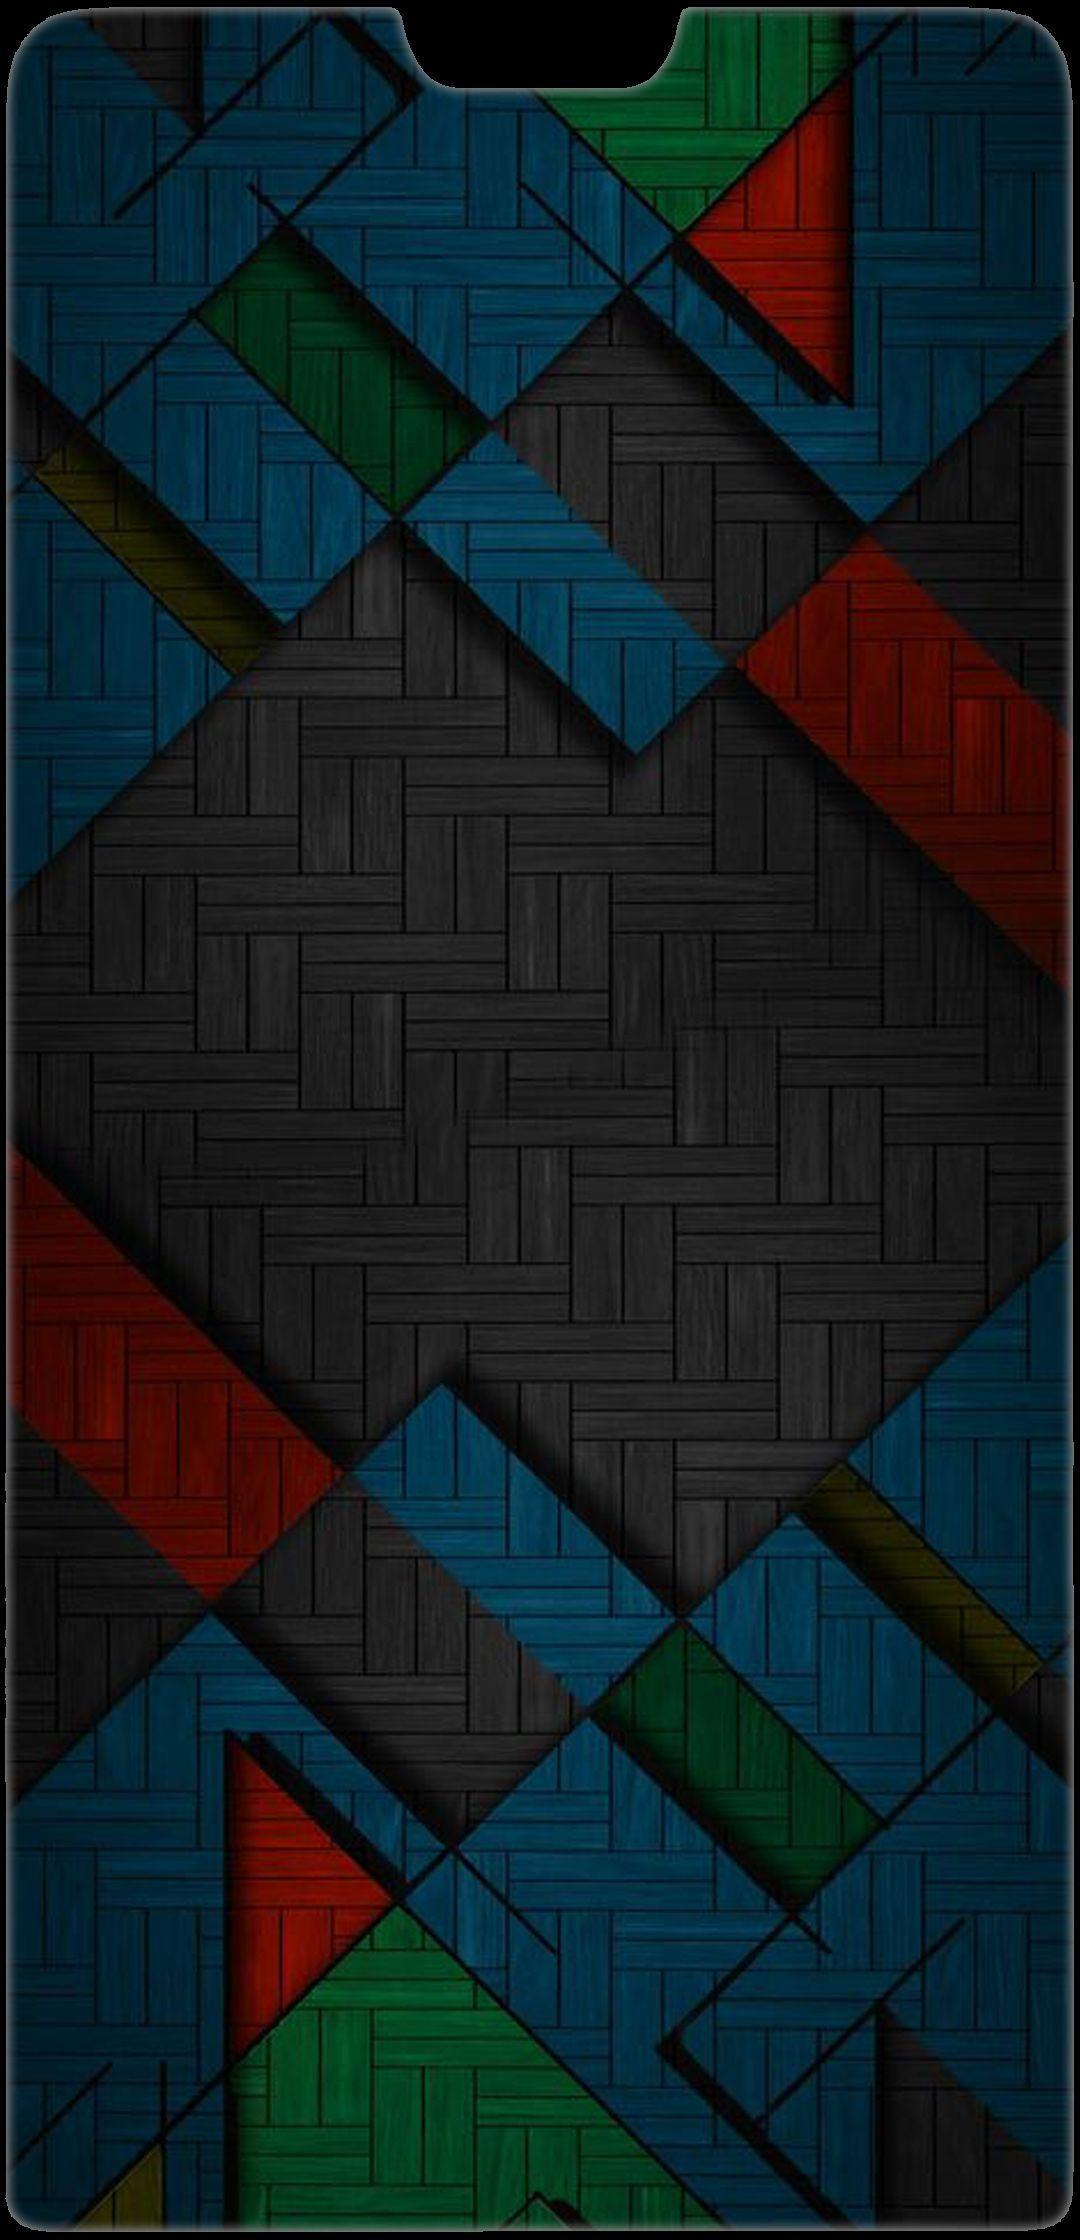 Notch Screen Wallpapers - Wallpaper Cave